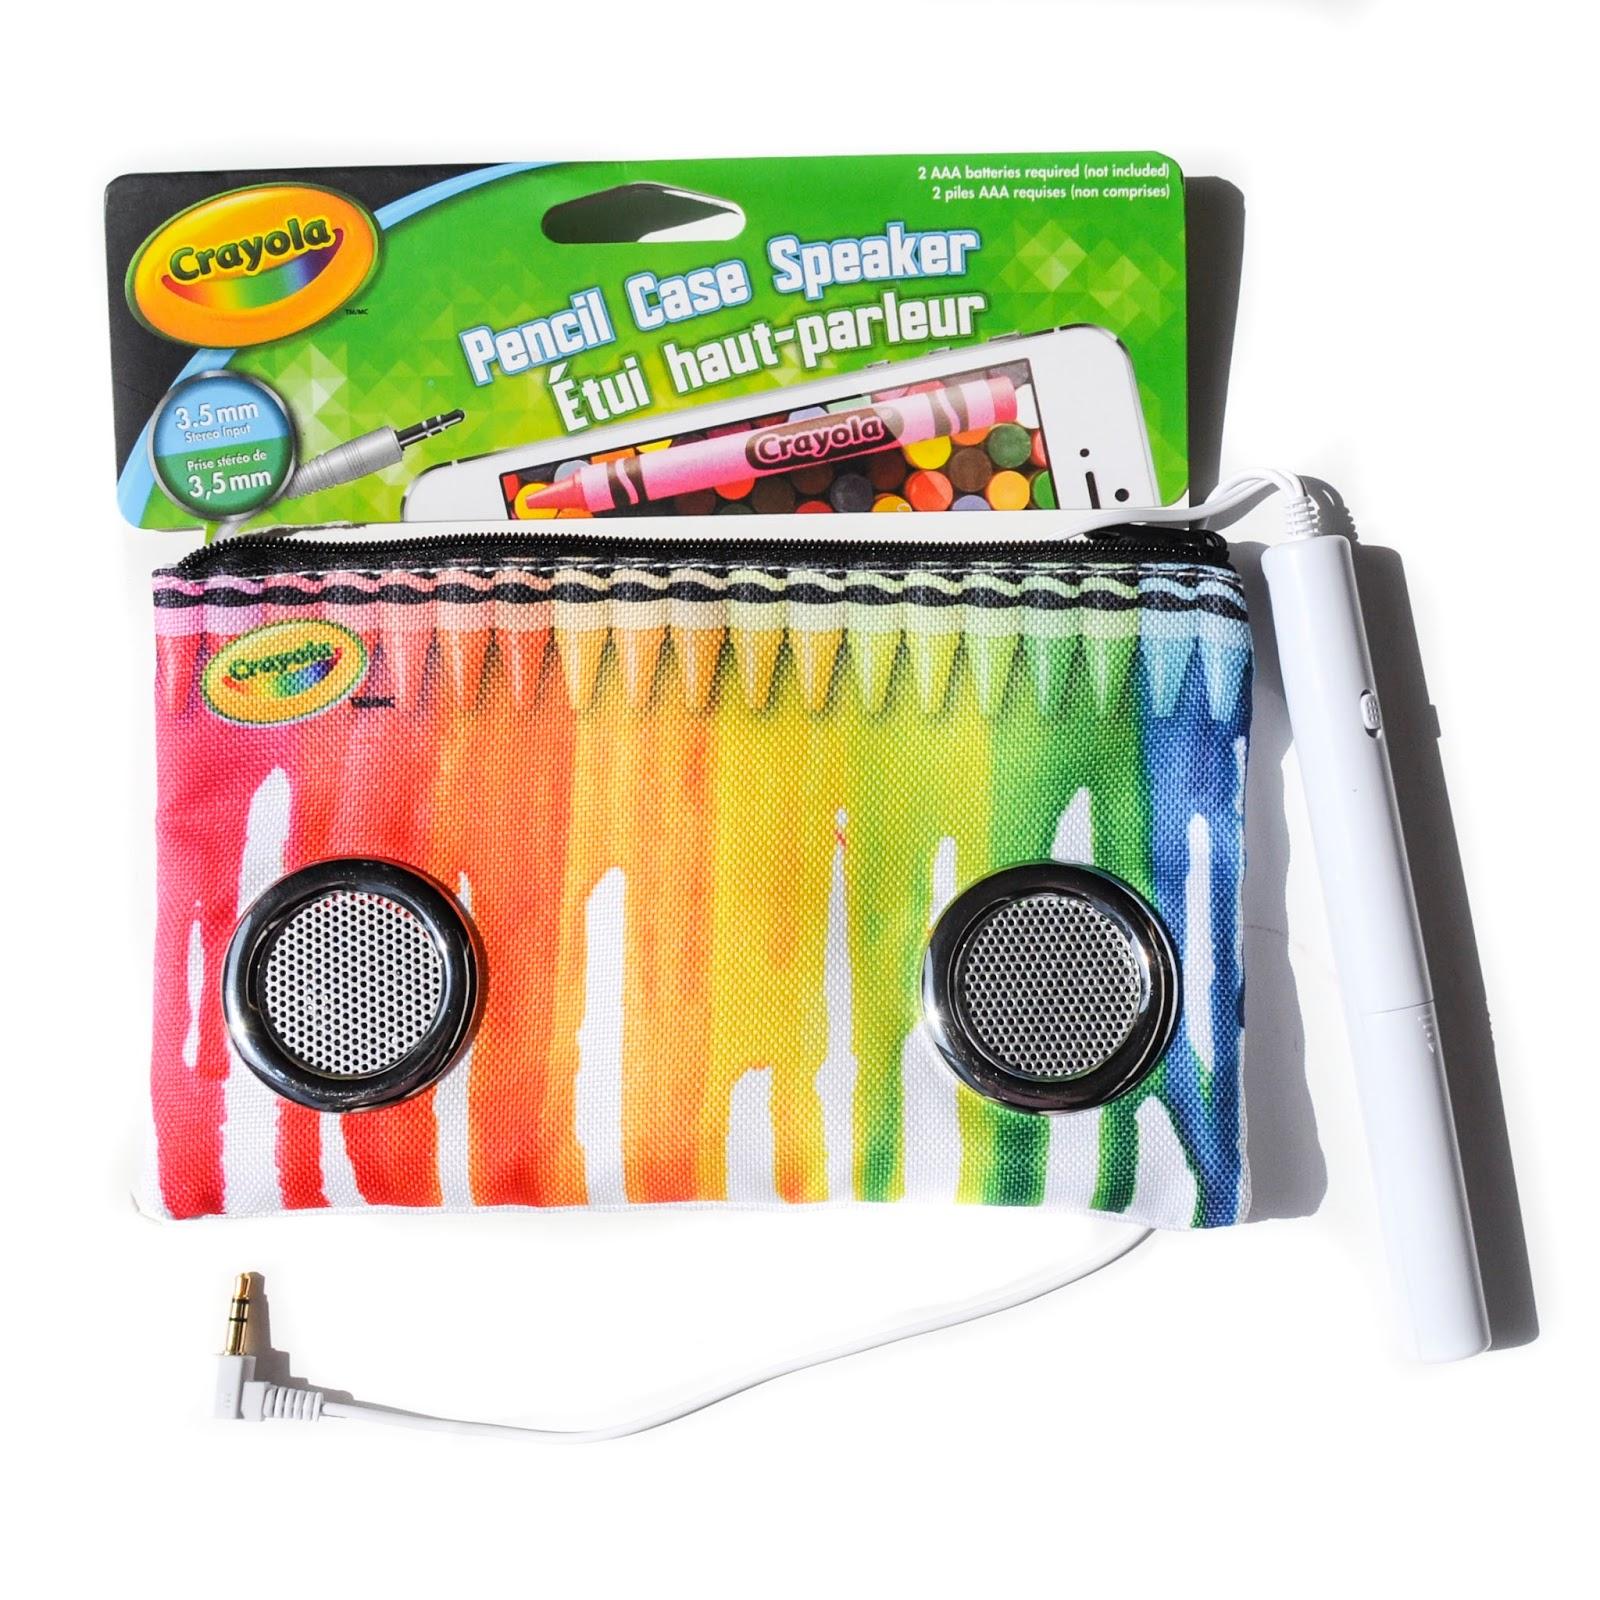 100 Crayola Bathtub Fingerpaint Soap Target Amazing